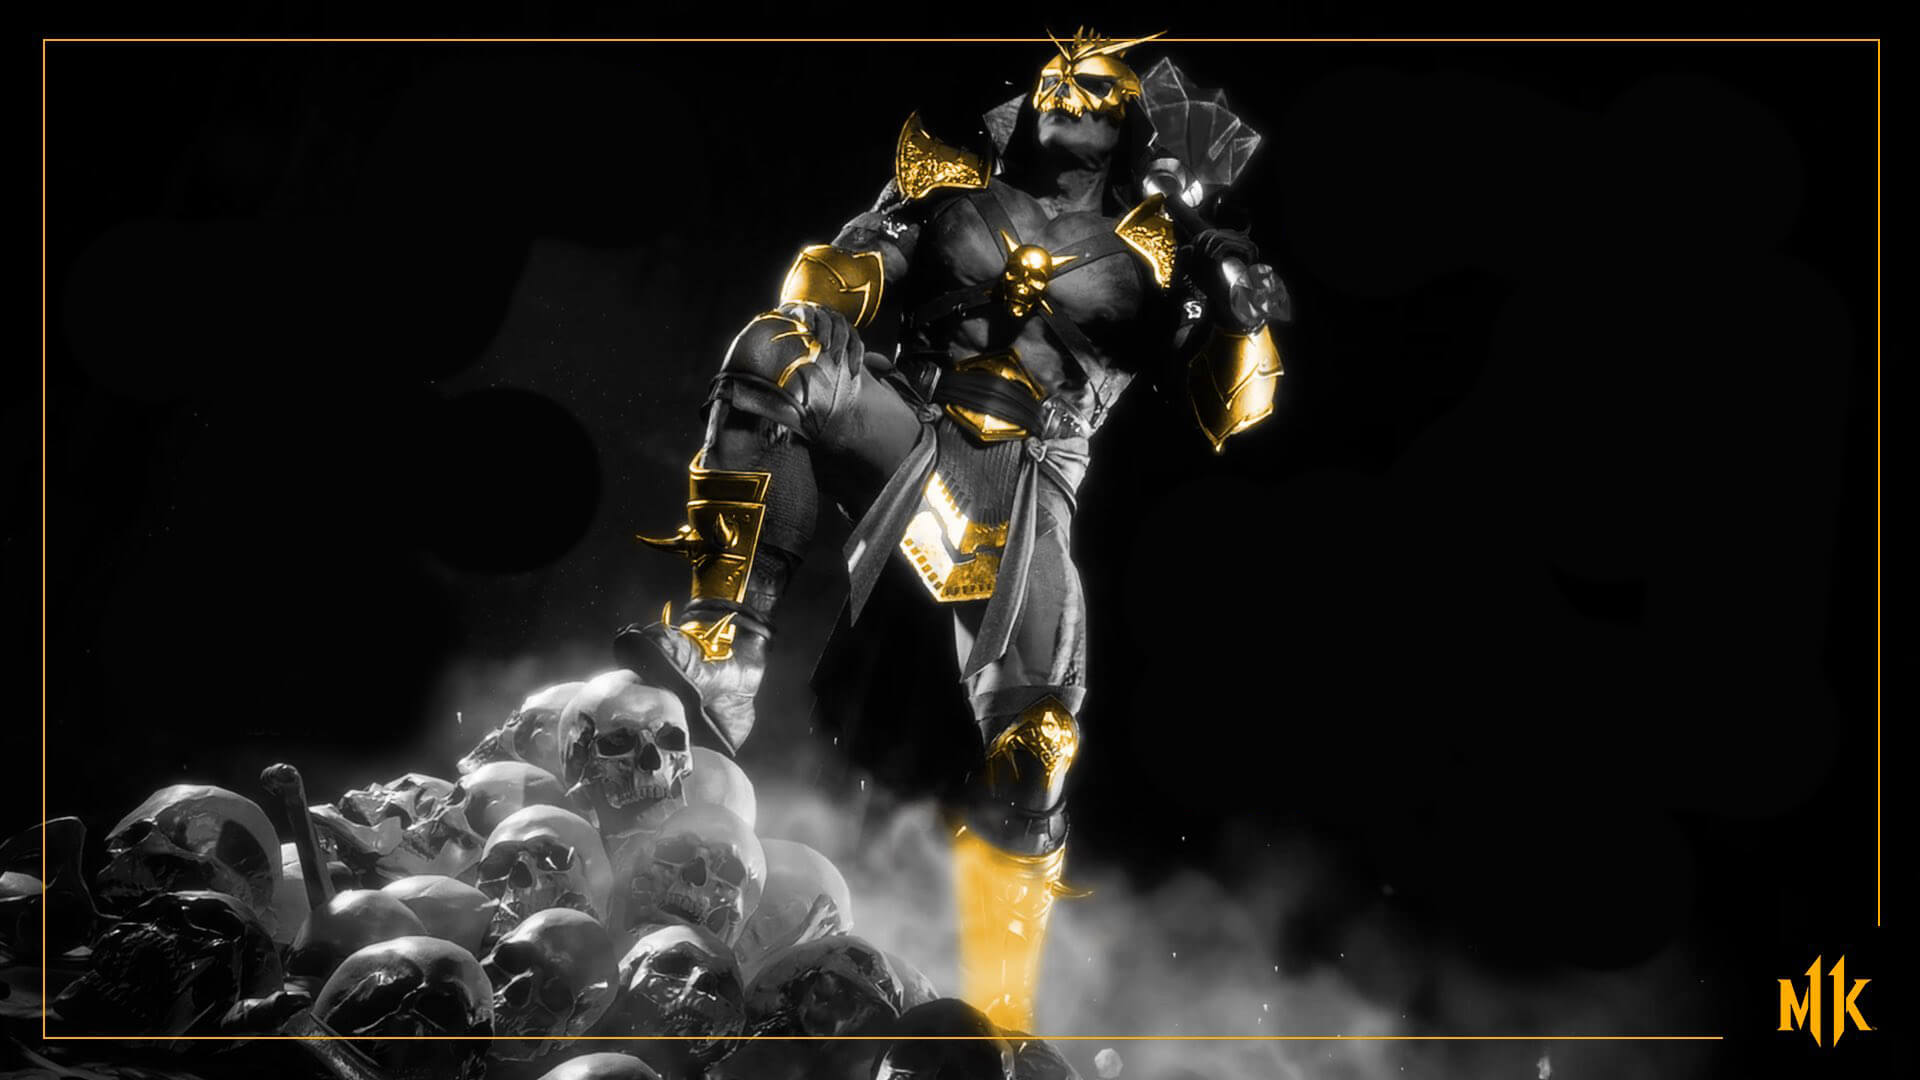 Mortal Kombat 11 Ultimate pre-order opens in 2 days